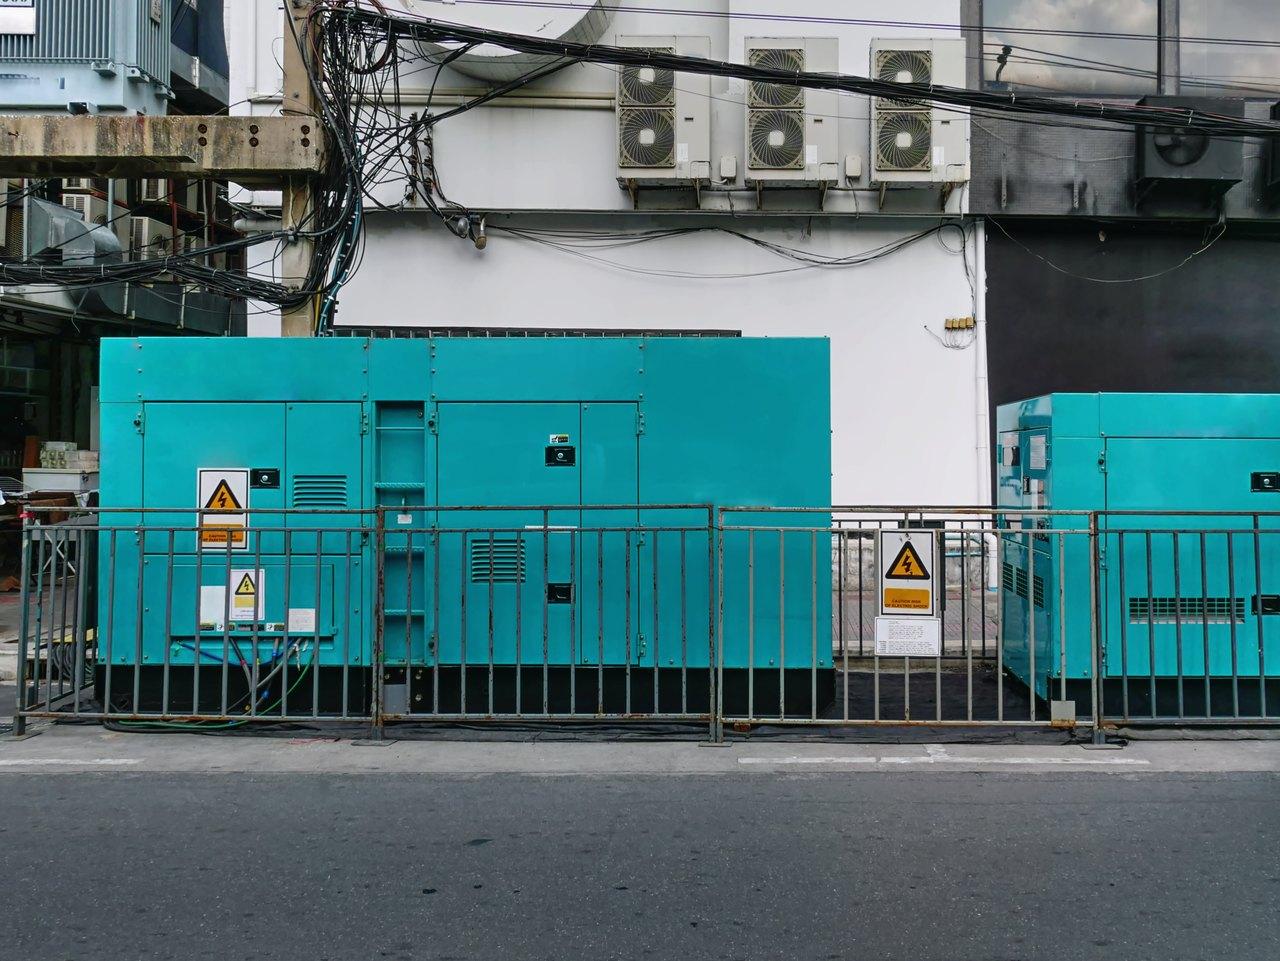 mobile-unit-of-emergency-electric-power-generator--MXL6CBR_Easy-Resize.com